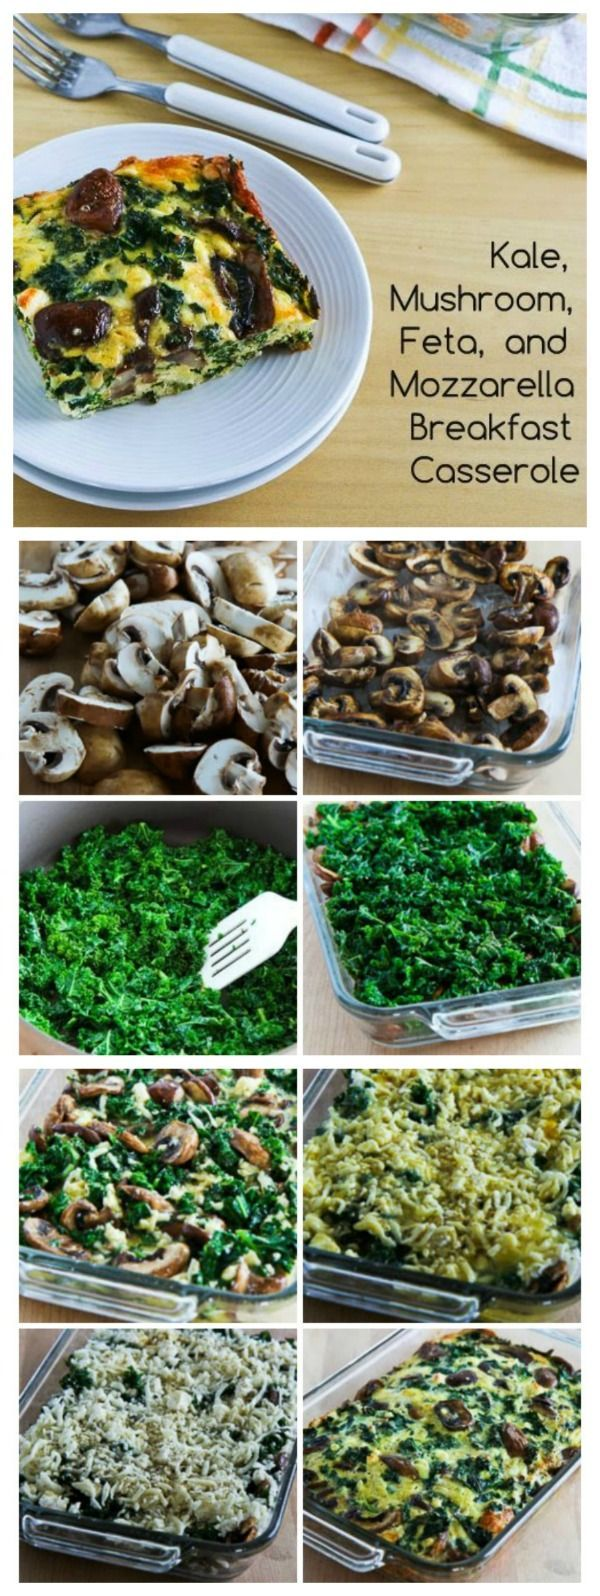 Traditional Kale, Mushroom, Feta, and Mozzarella Breakfast Casserole ...